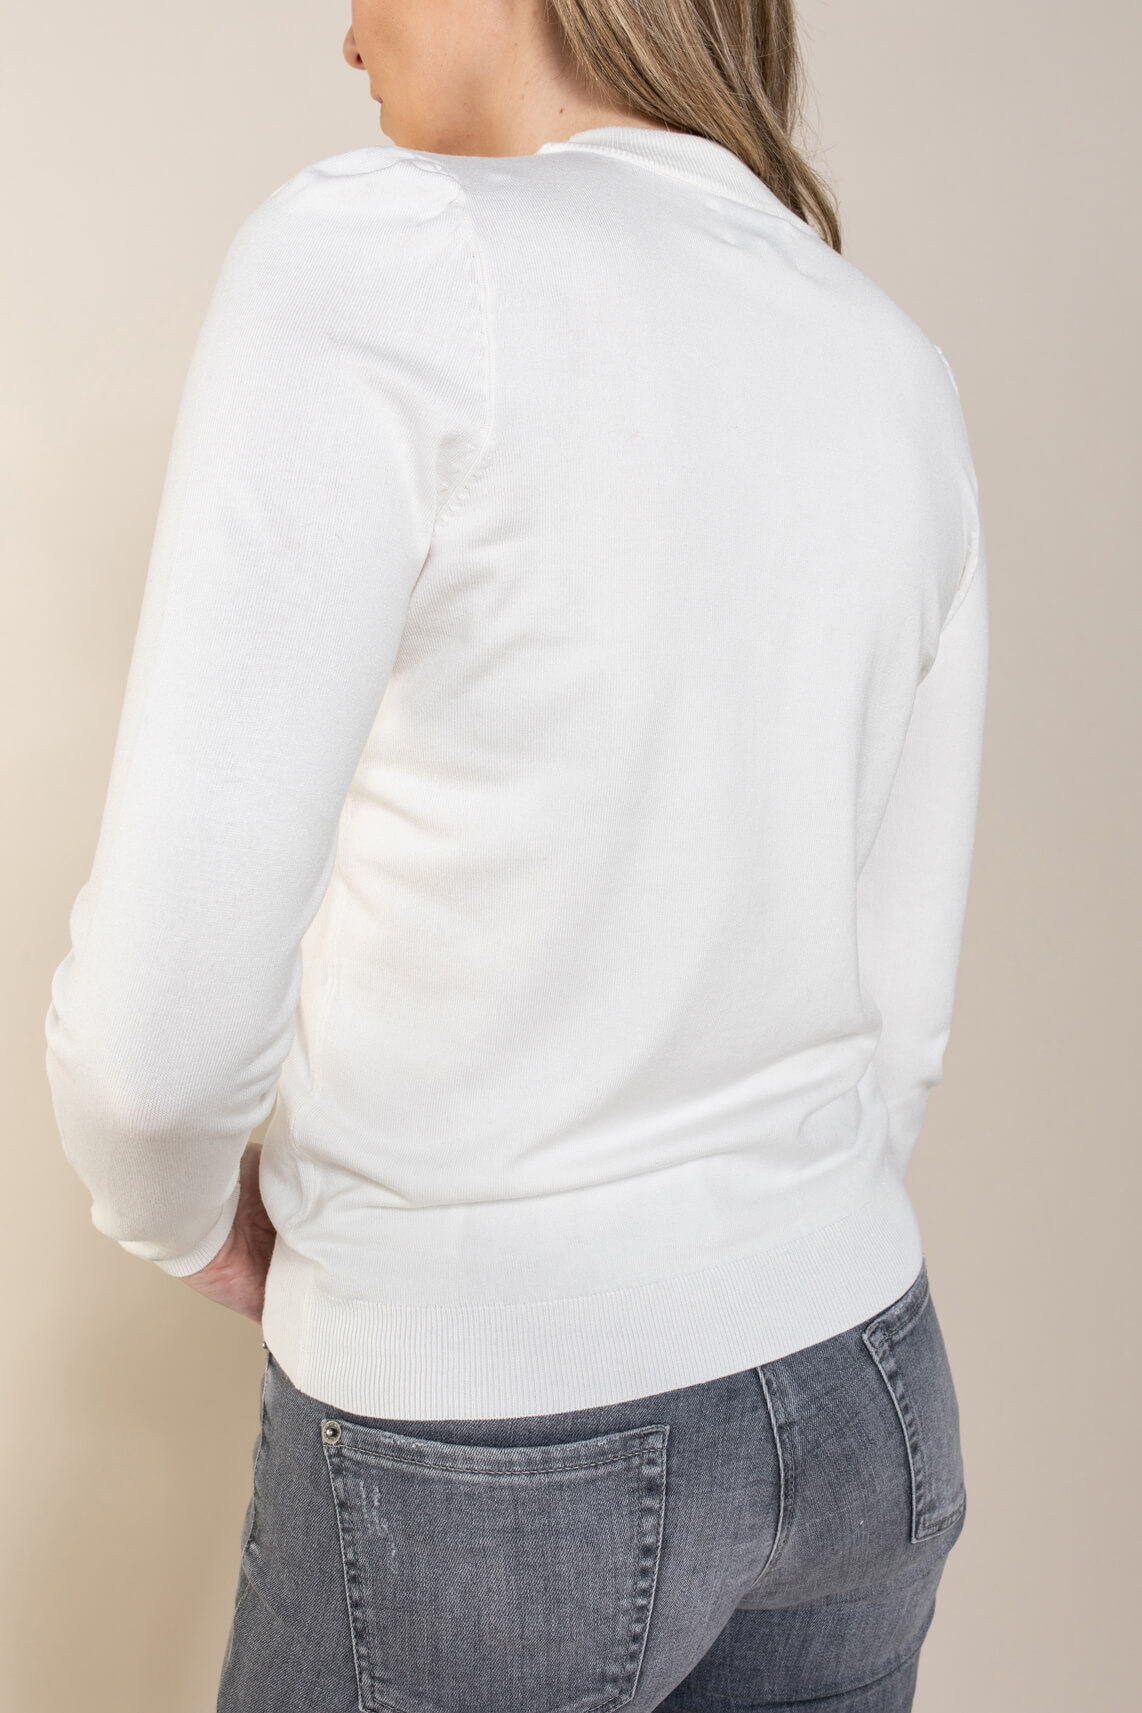 Numph Dames Baojin pullover wit